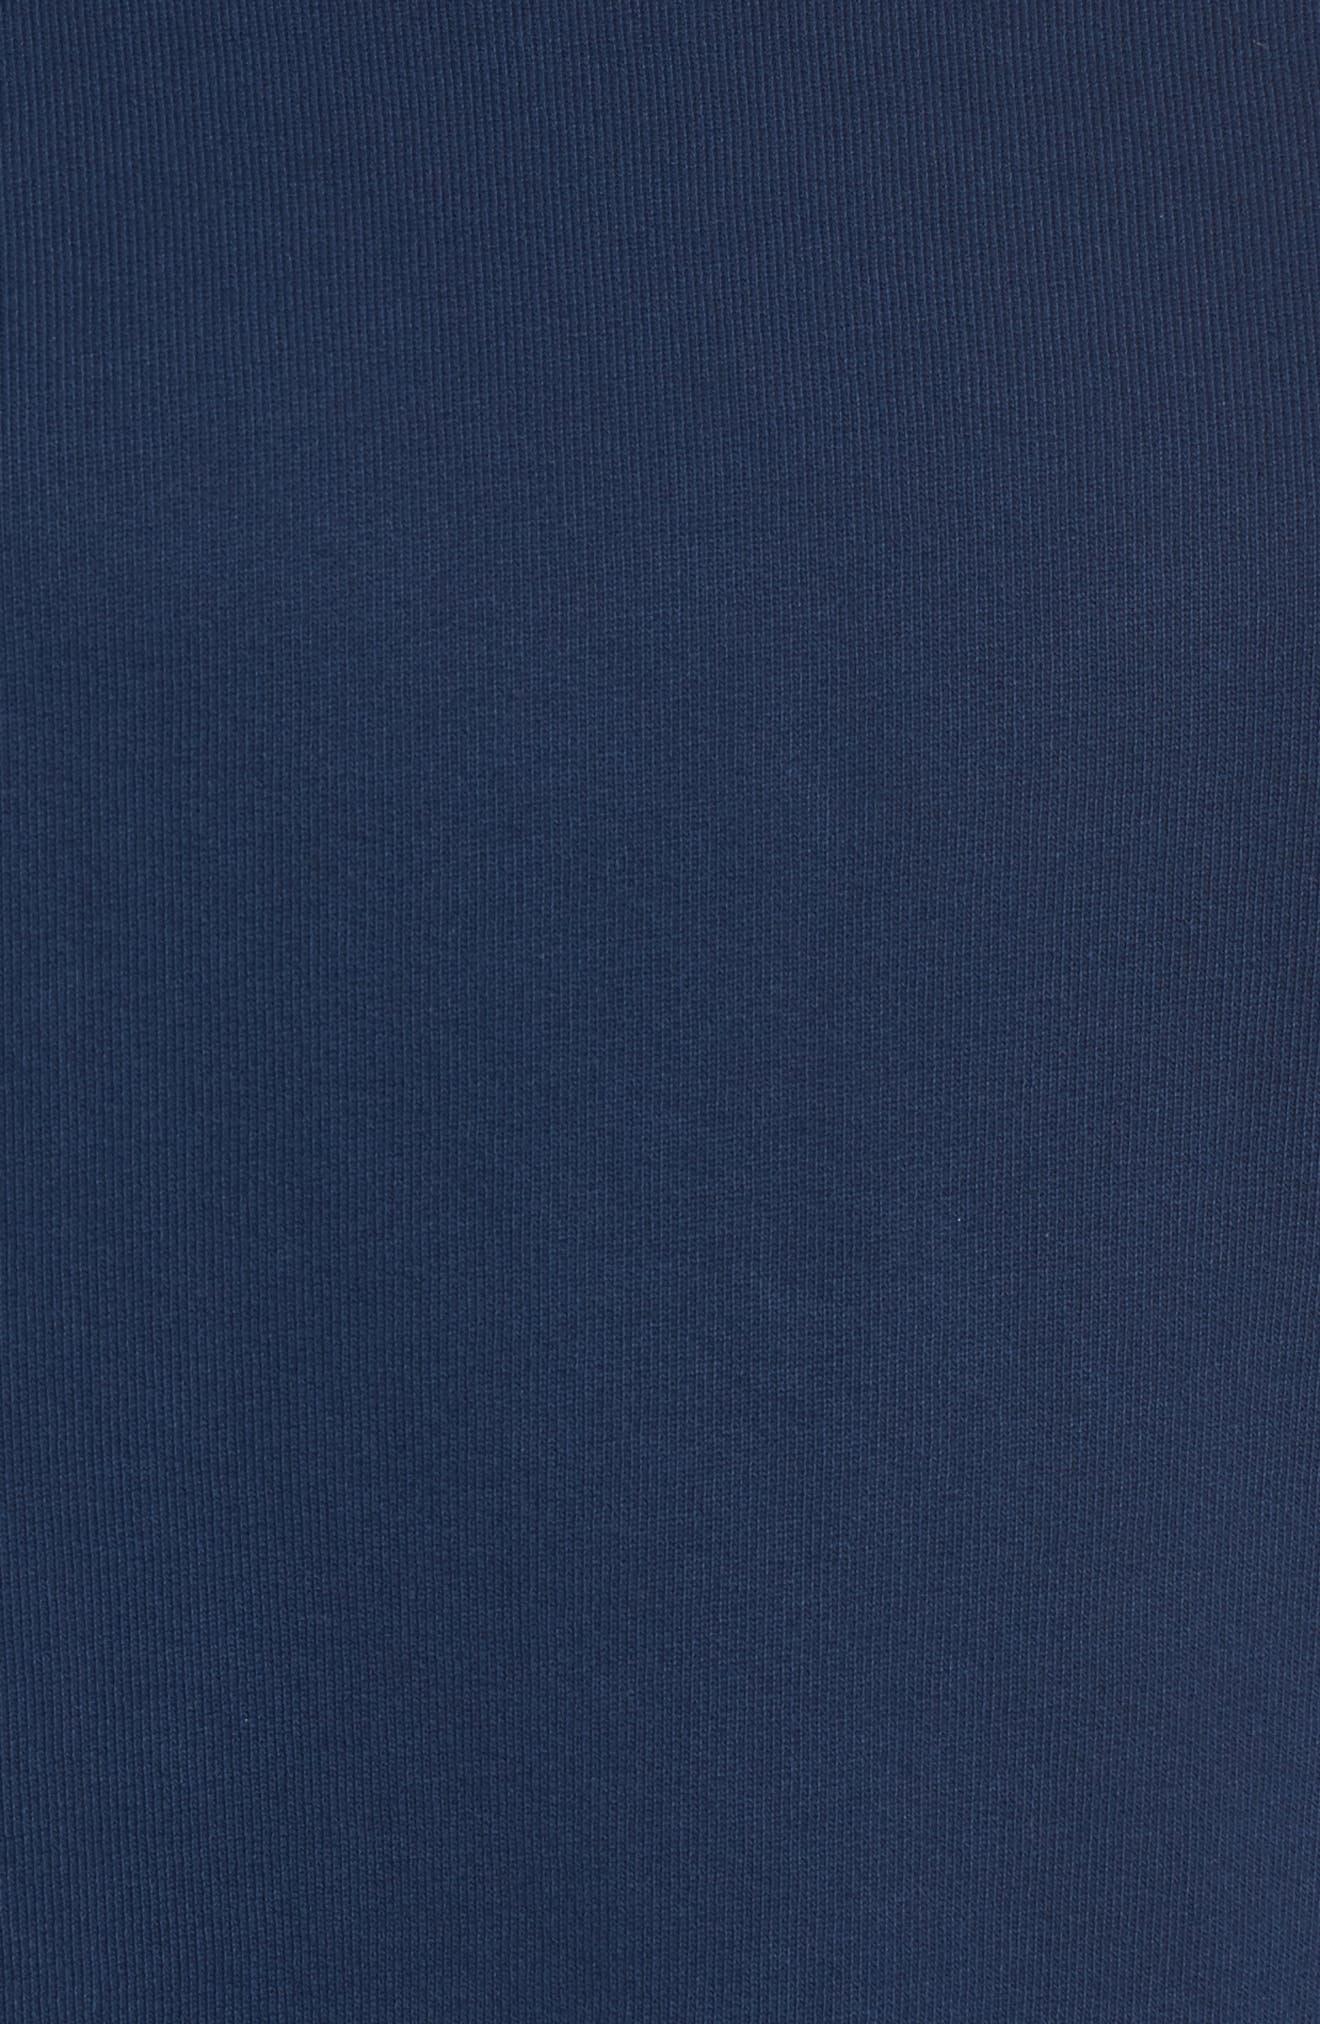 Alternate Image 5  - Frank & Eileen Tee Lab Distressed Sweatshirt